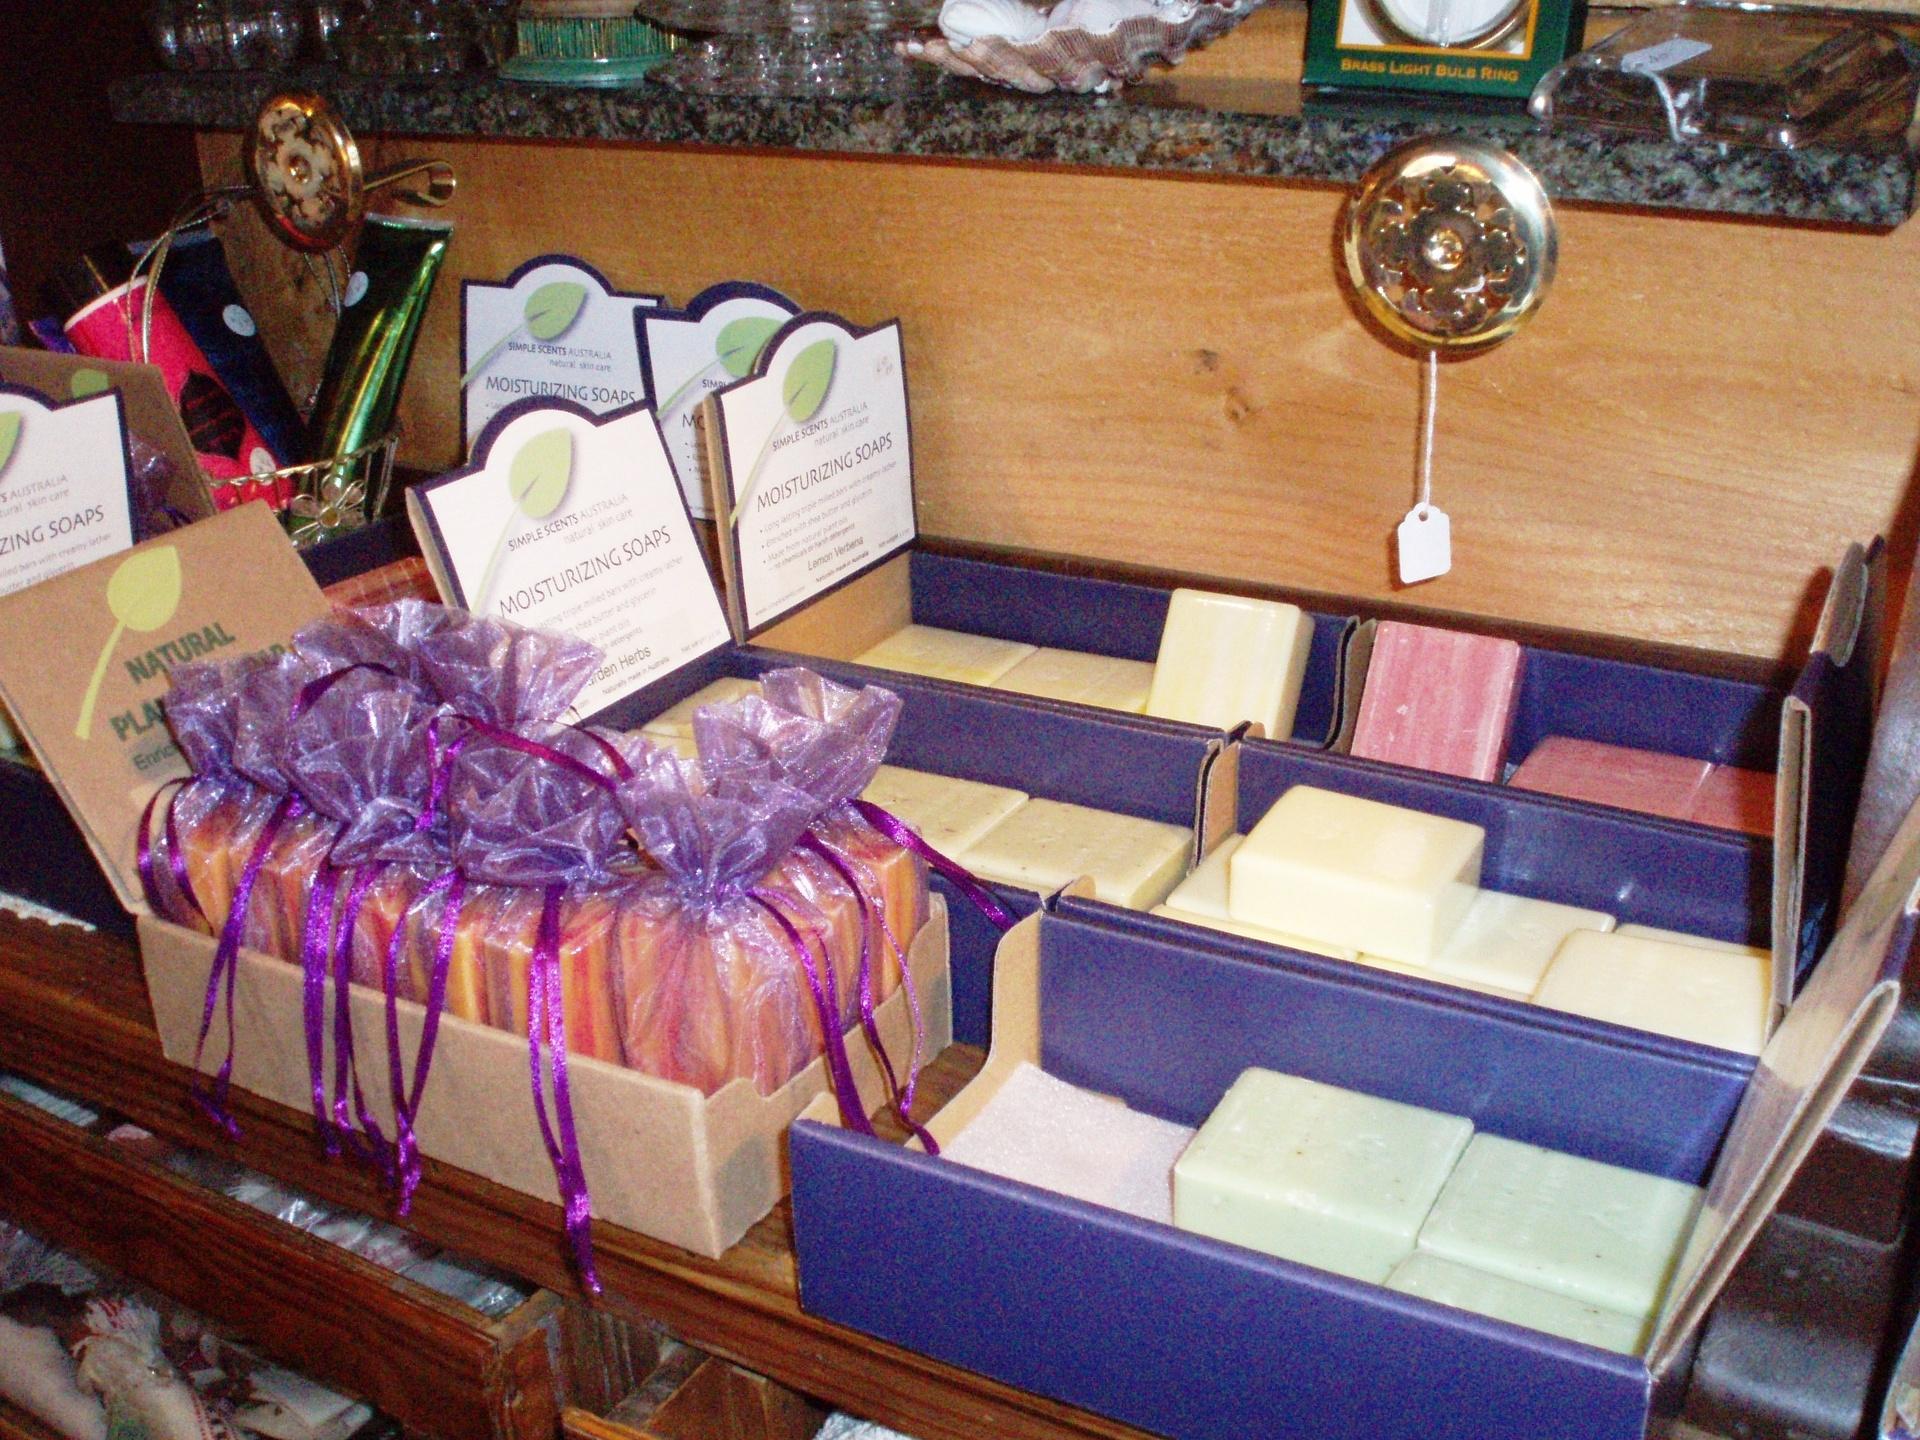 Imported Australian Handmade Soaps